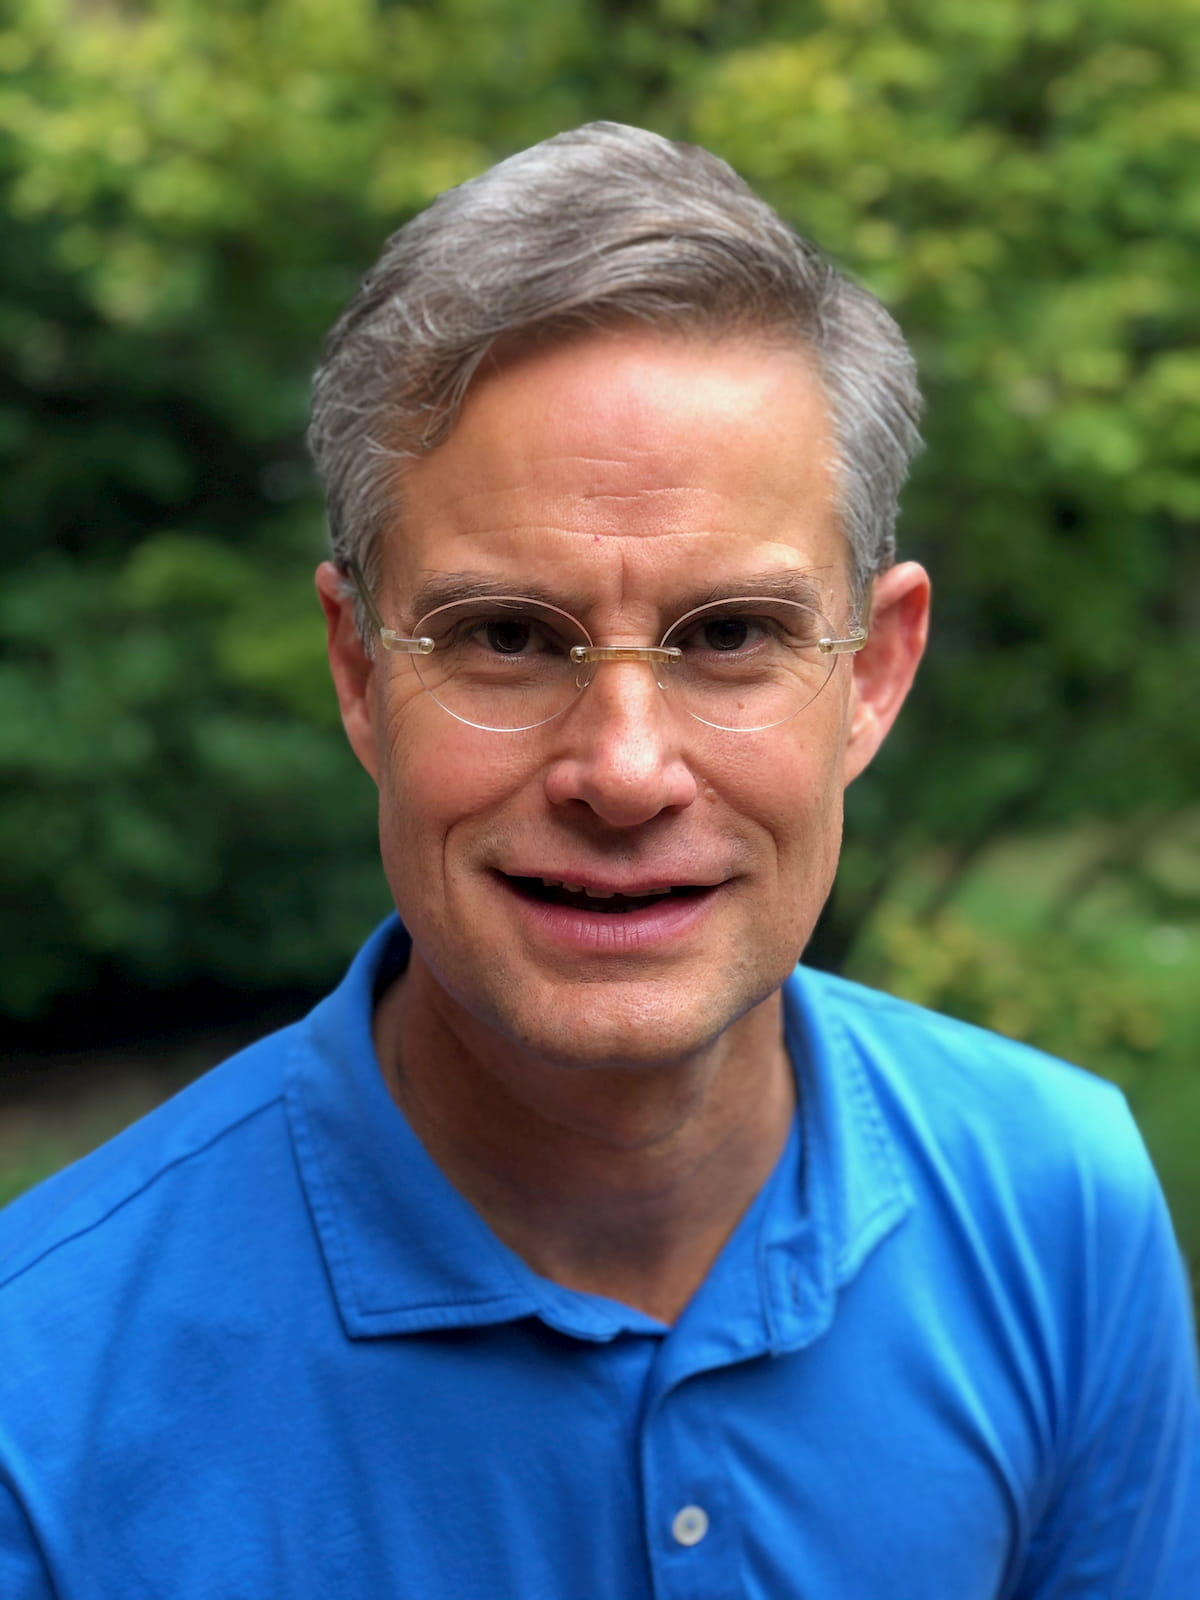 Howard Graham, Executive Director of The Center - Memphis